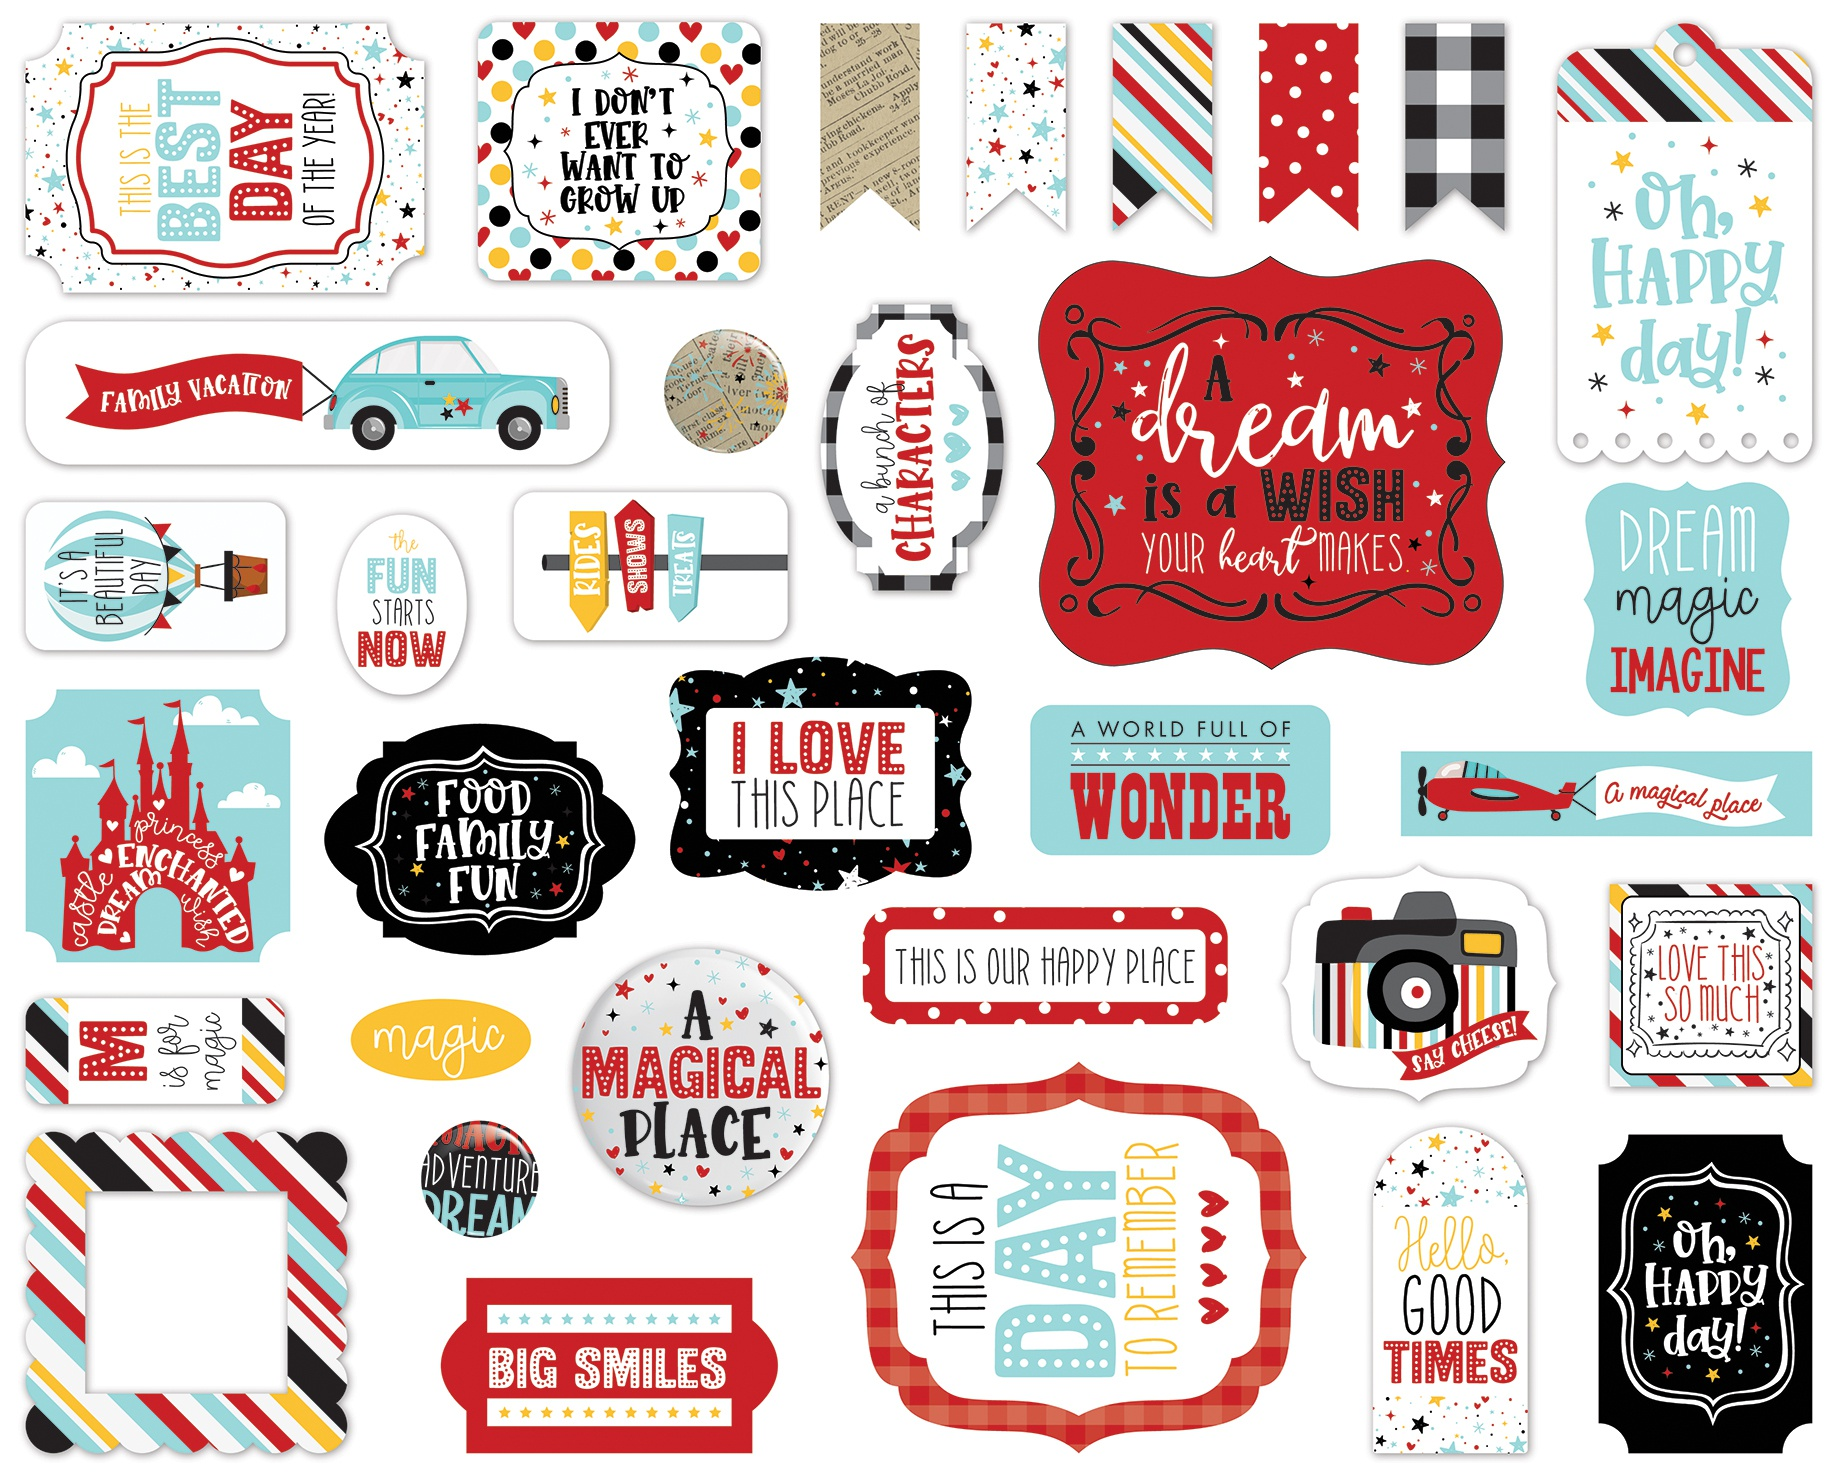 Echo Park Cardstock Ephemera 33/Pkg-Icons, A Magical Place